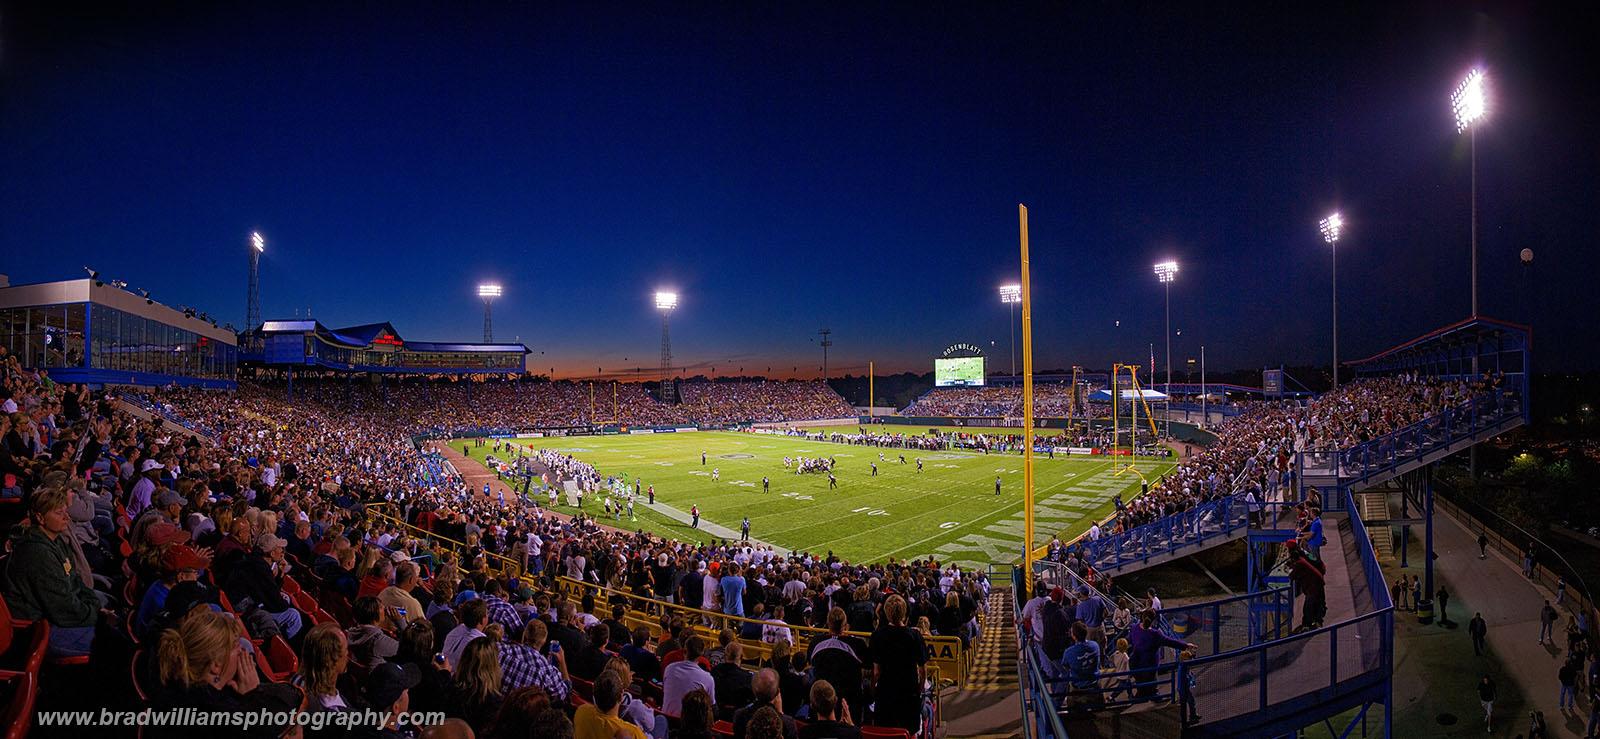 The first ever Omaha Nighthawks game atRosenblatt Stadium, Omaha, Nebraska